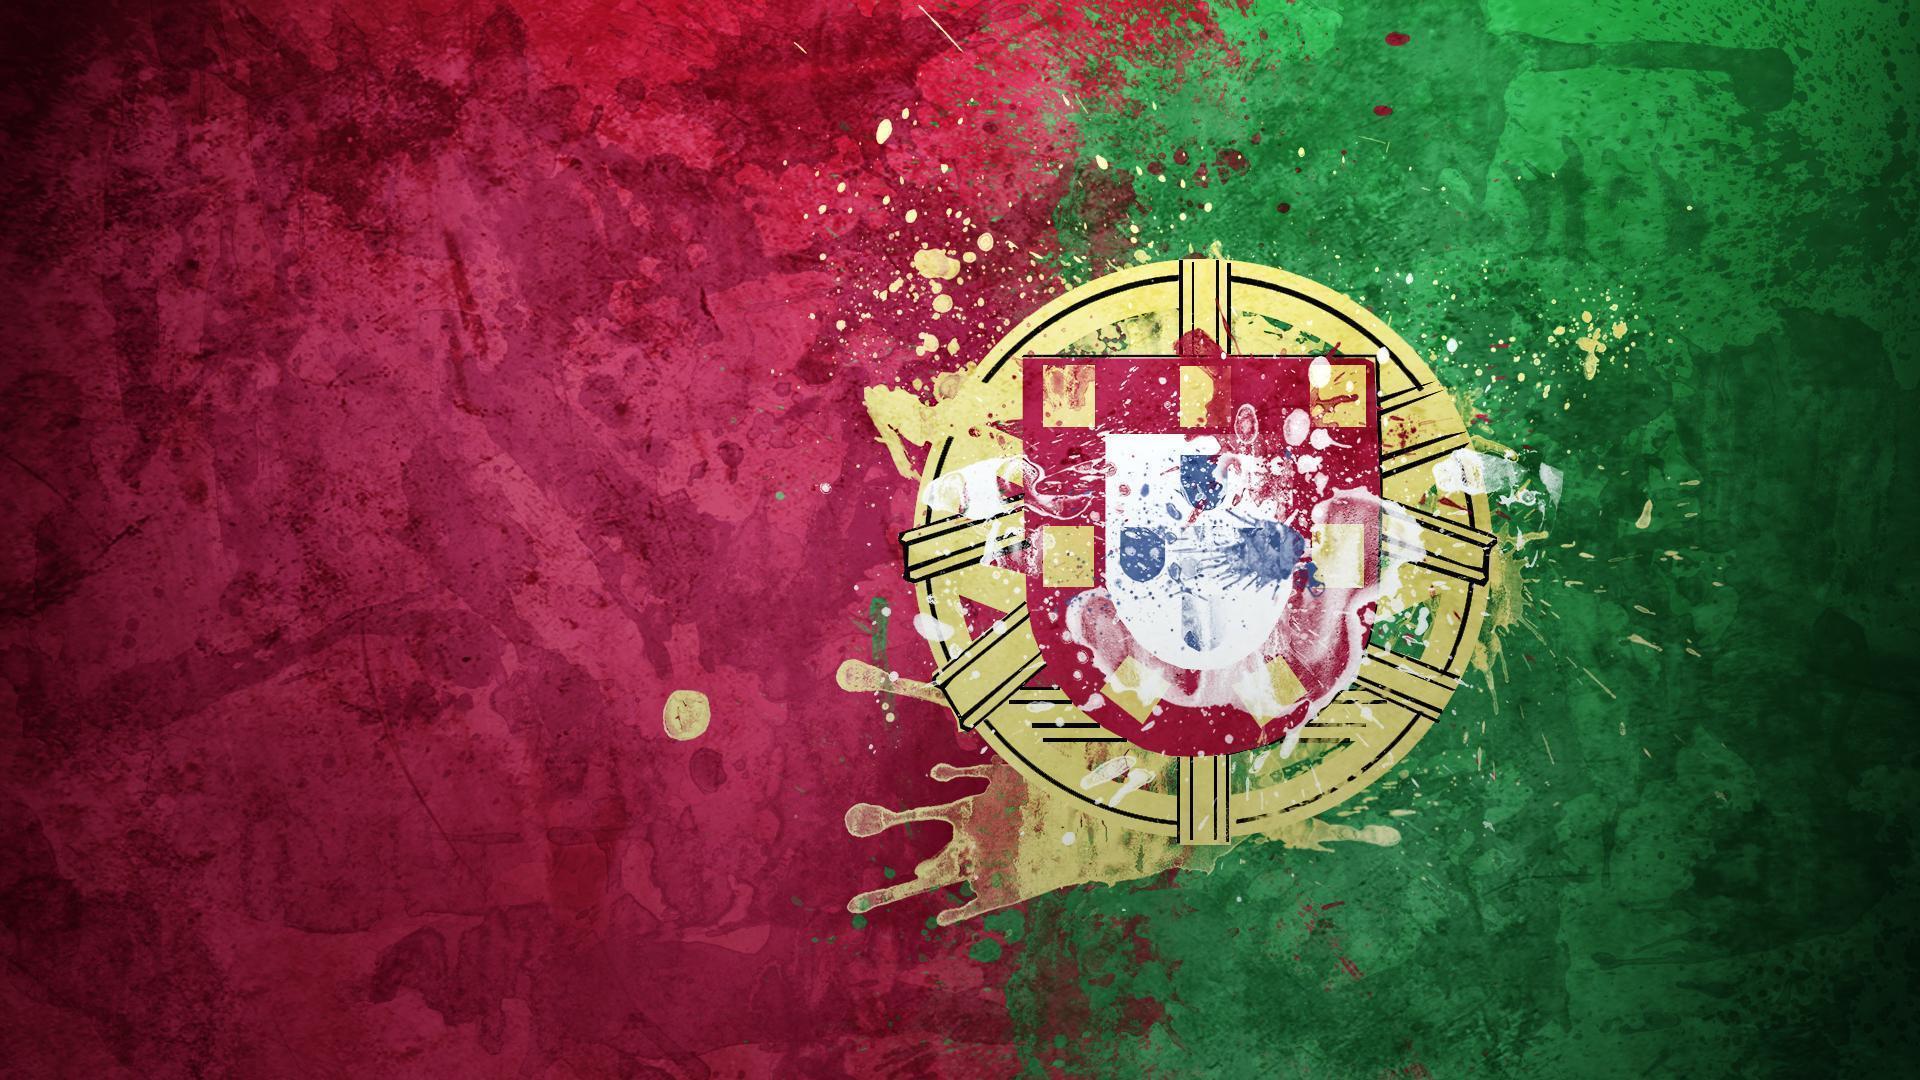 National Football Teams 2016 HD Wallpapers 1920x1080